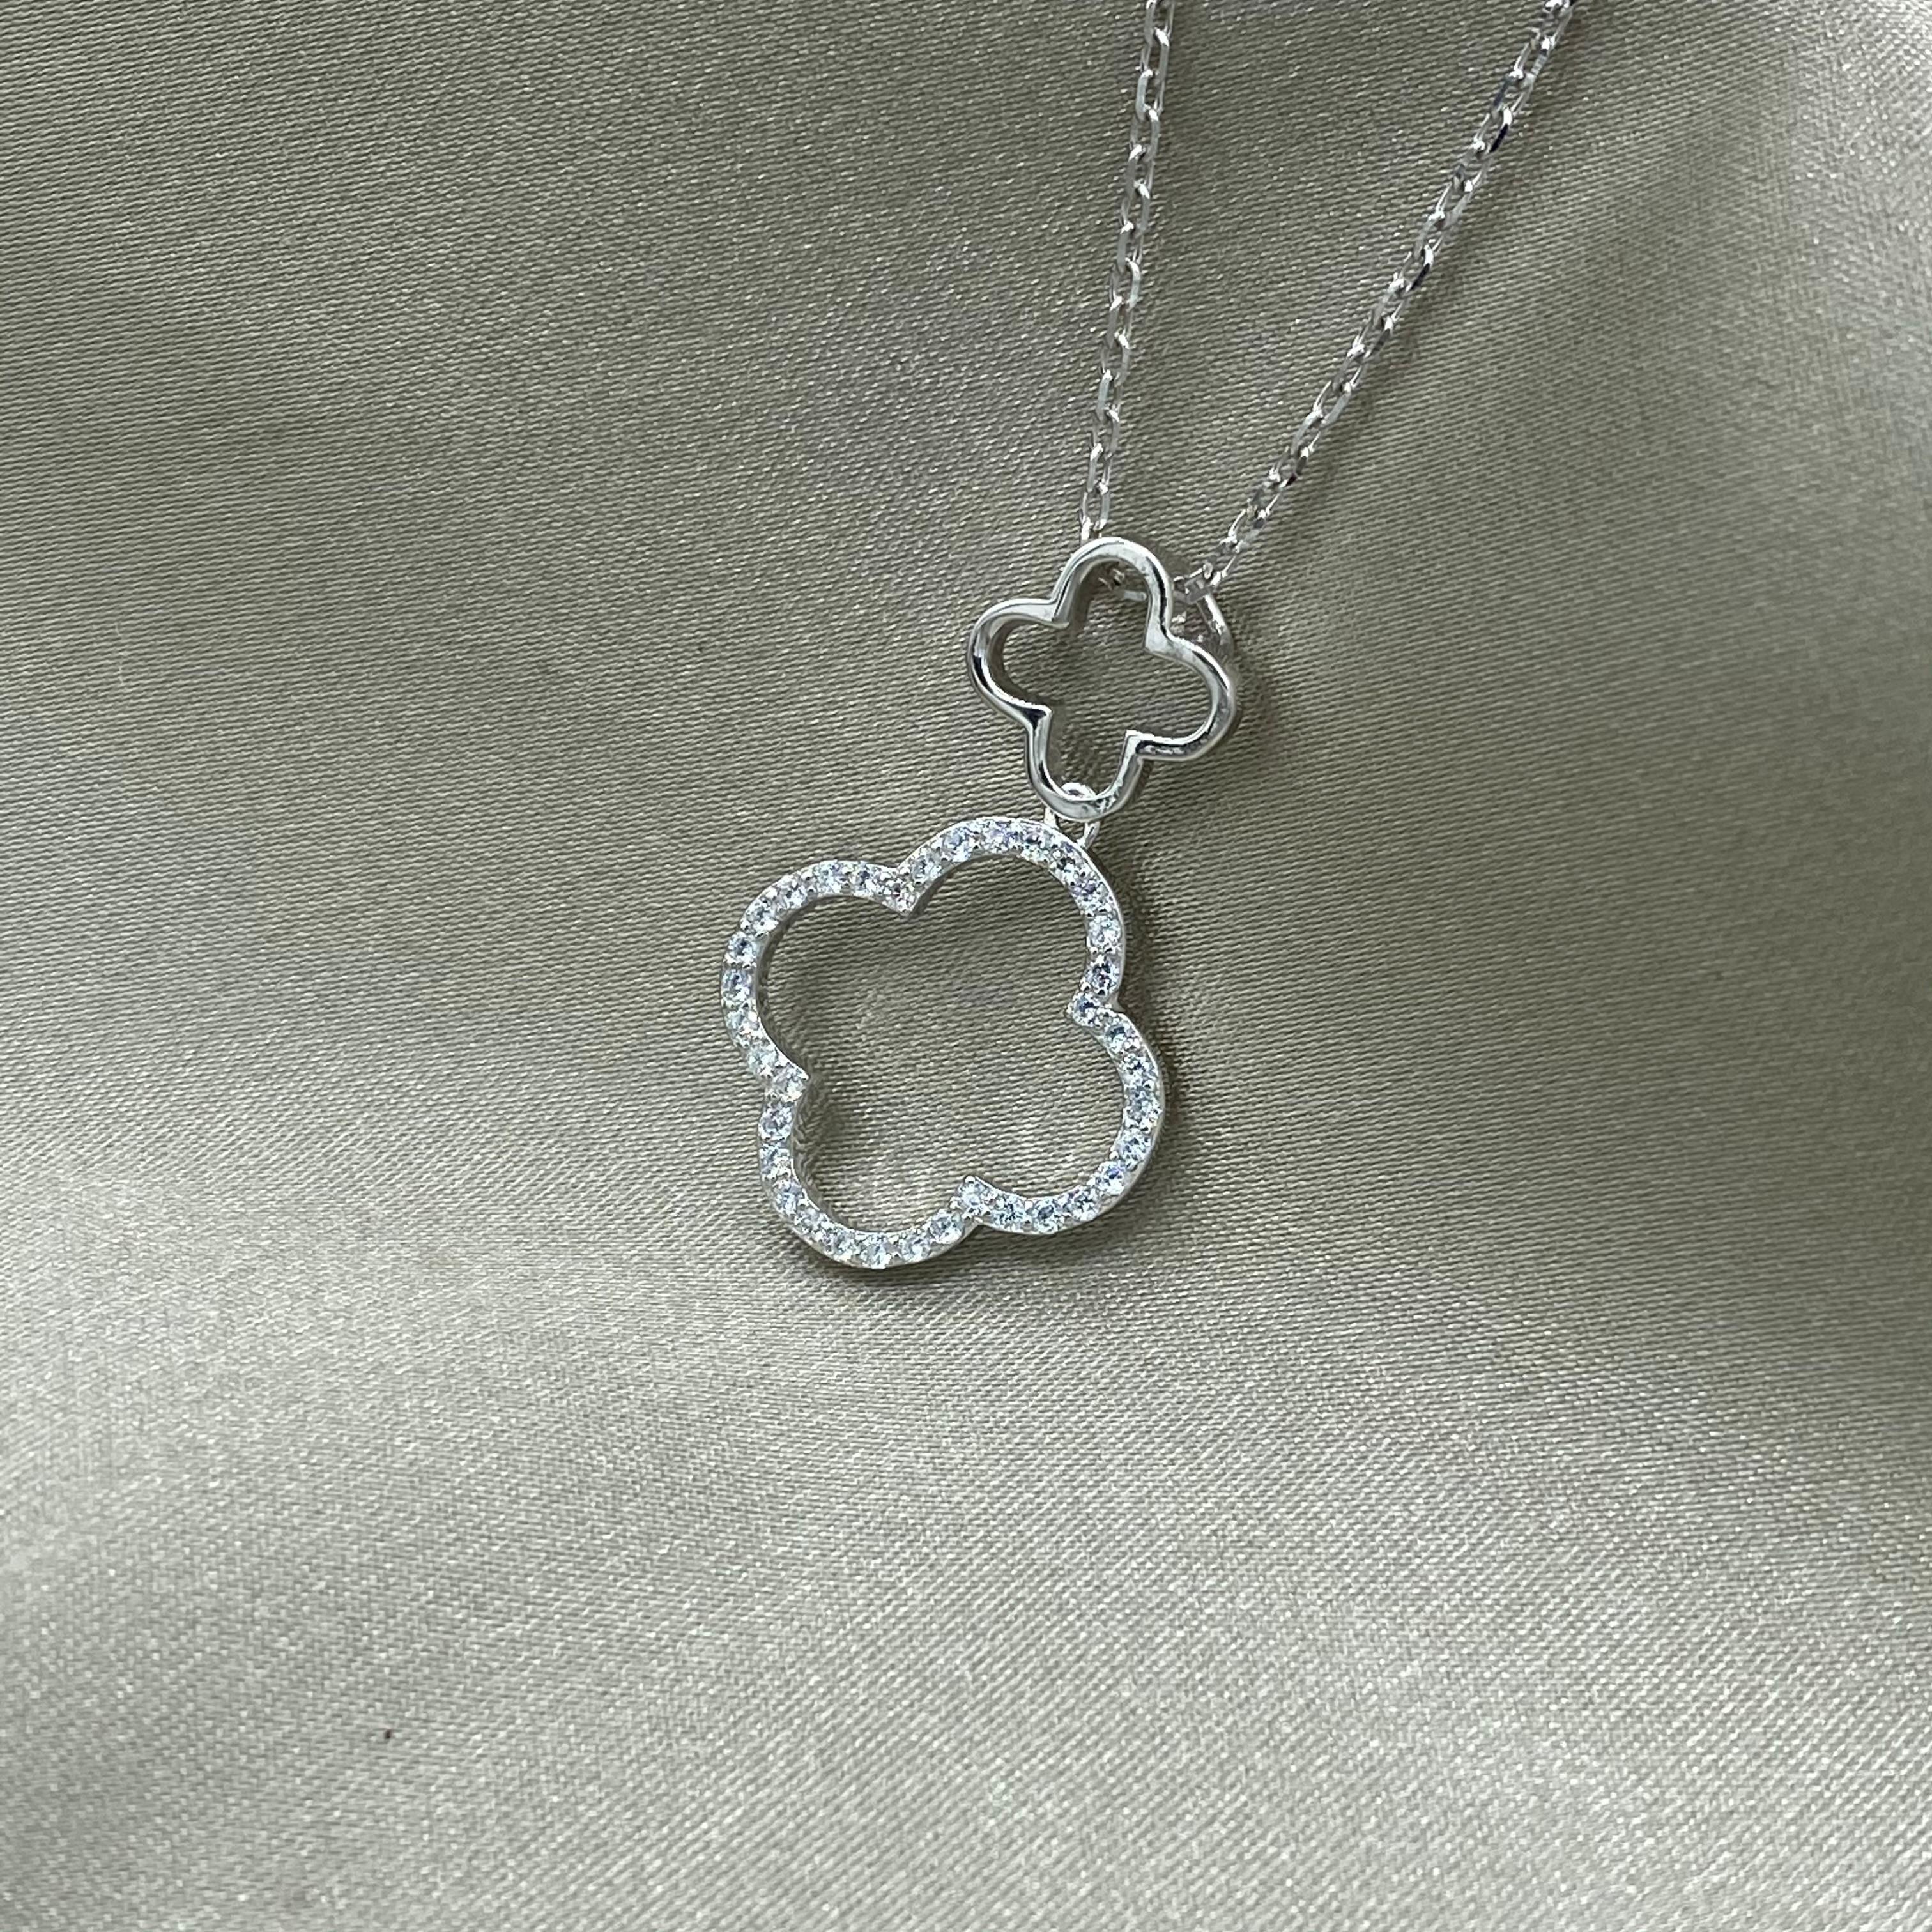 Rhodium plated zircon stone double clover necklace